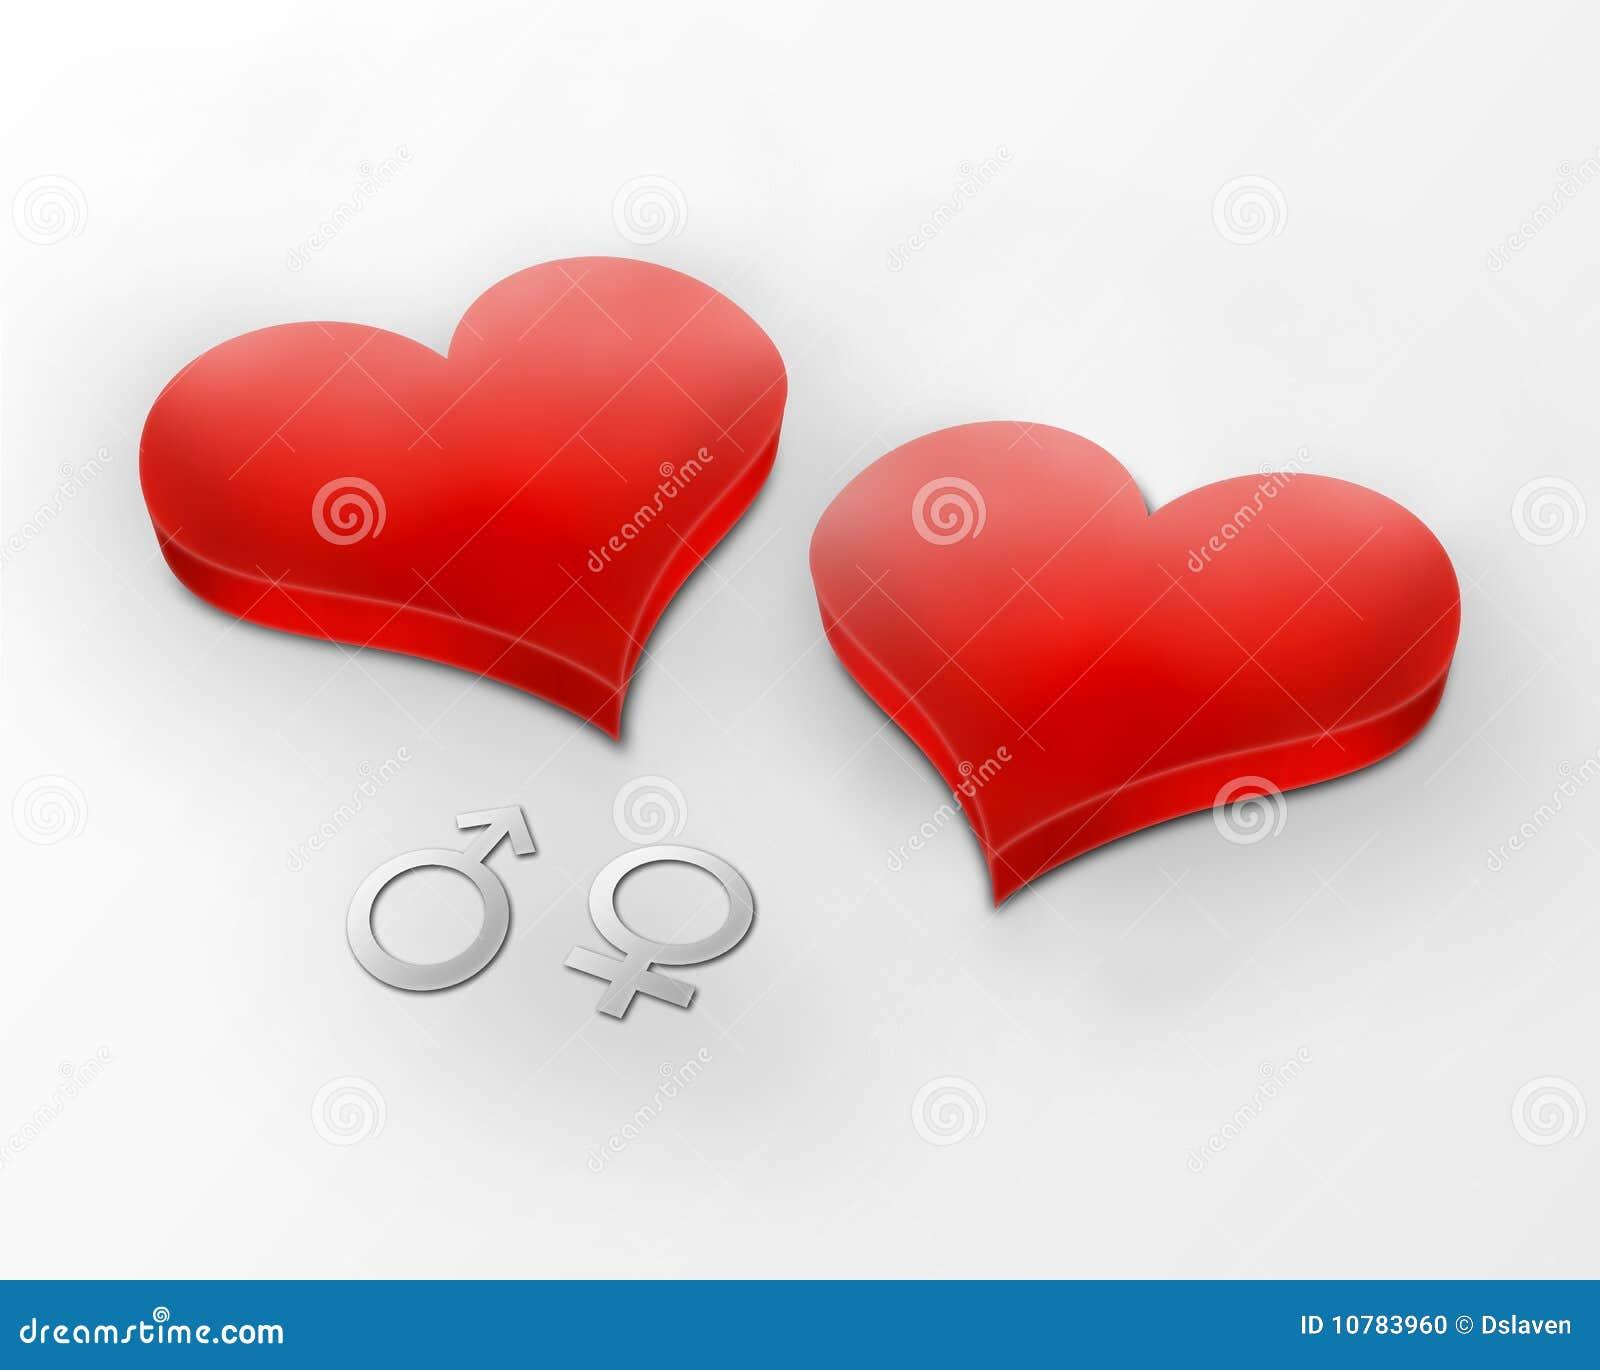 Human Hearts Sewn Together